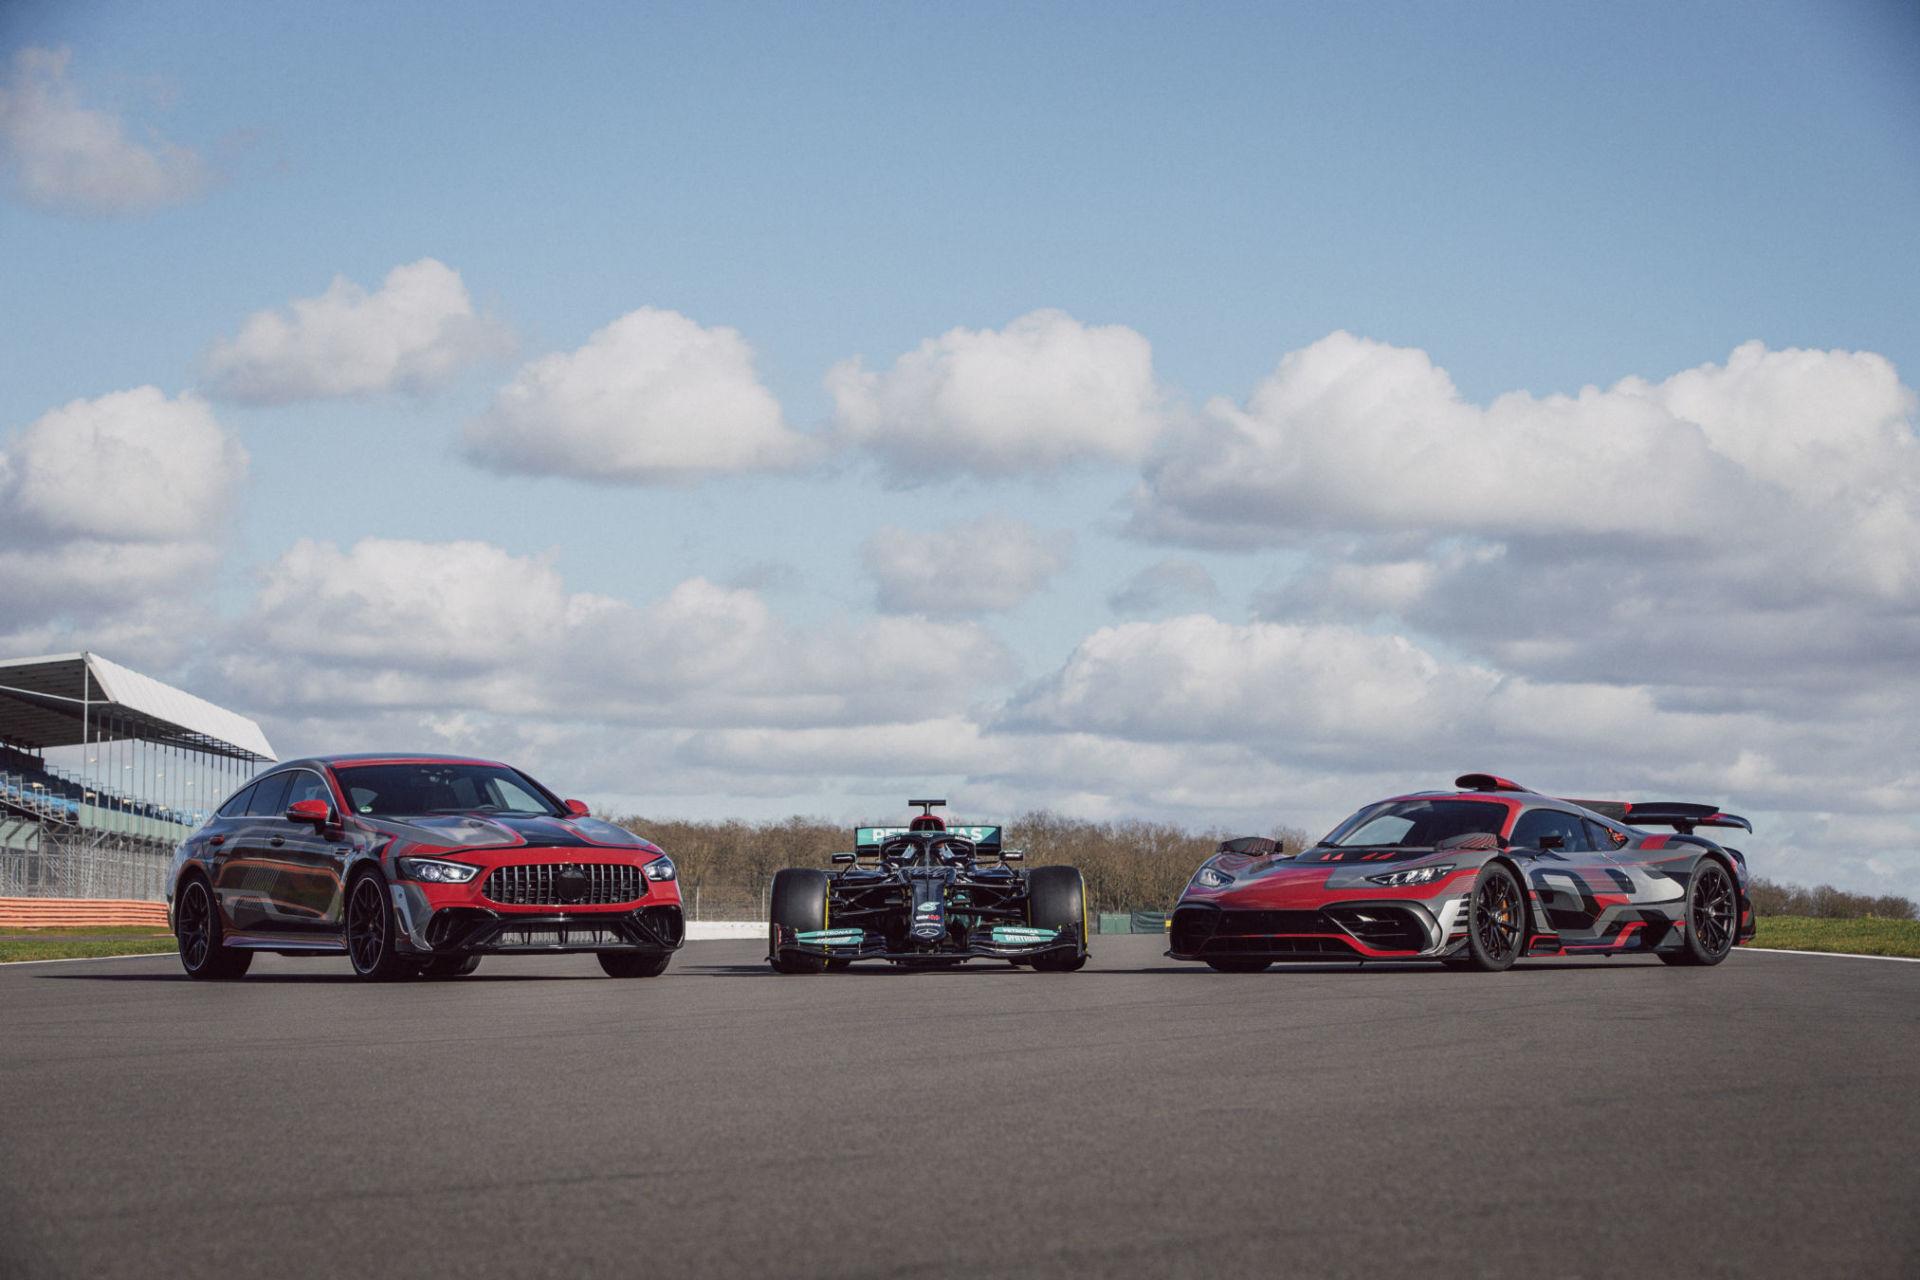 Mercedes-AMG : La GT 73 hybride ne se cache (presque) plus !